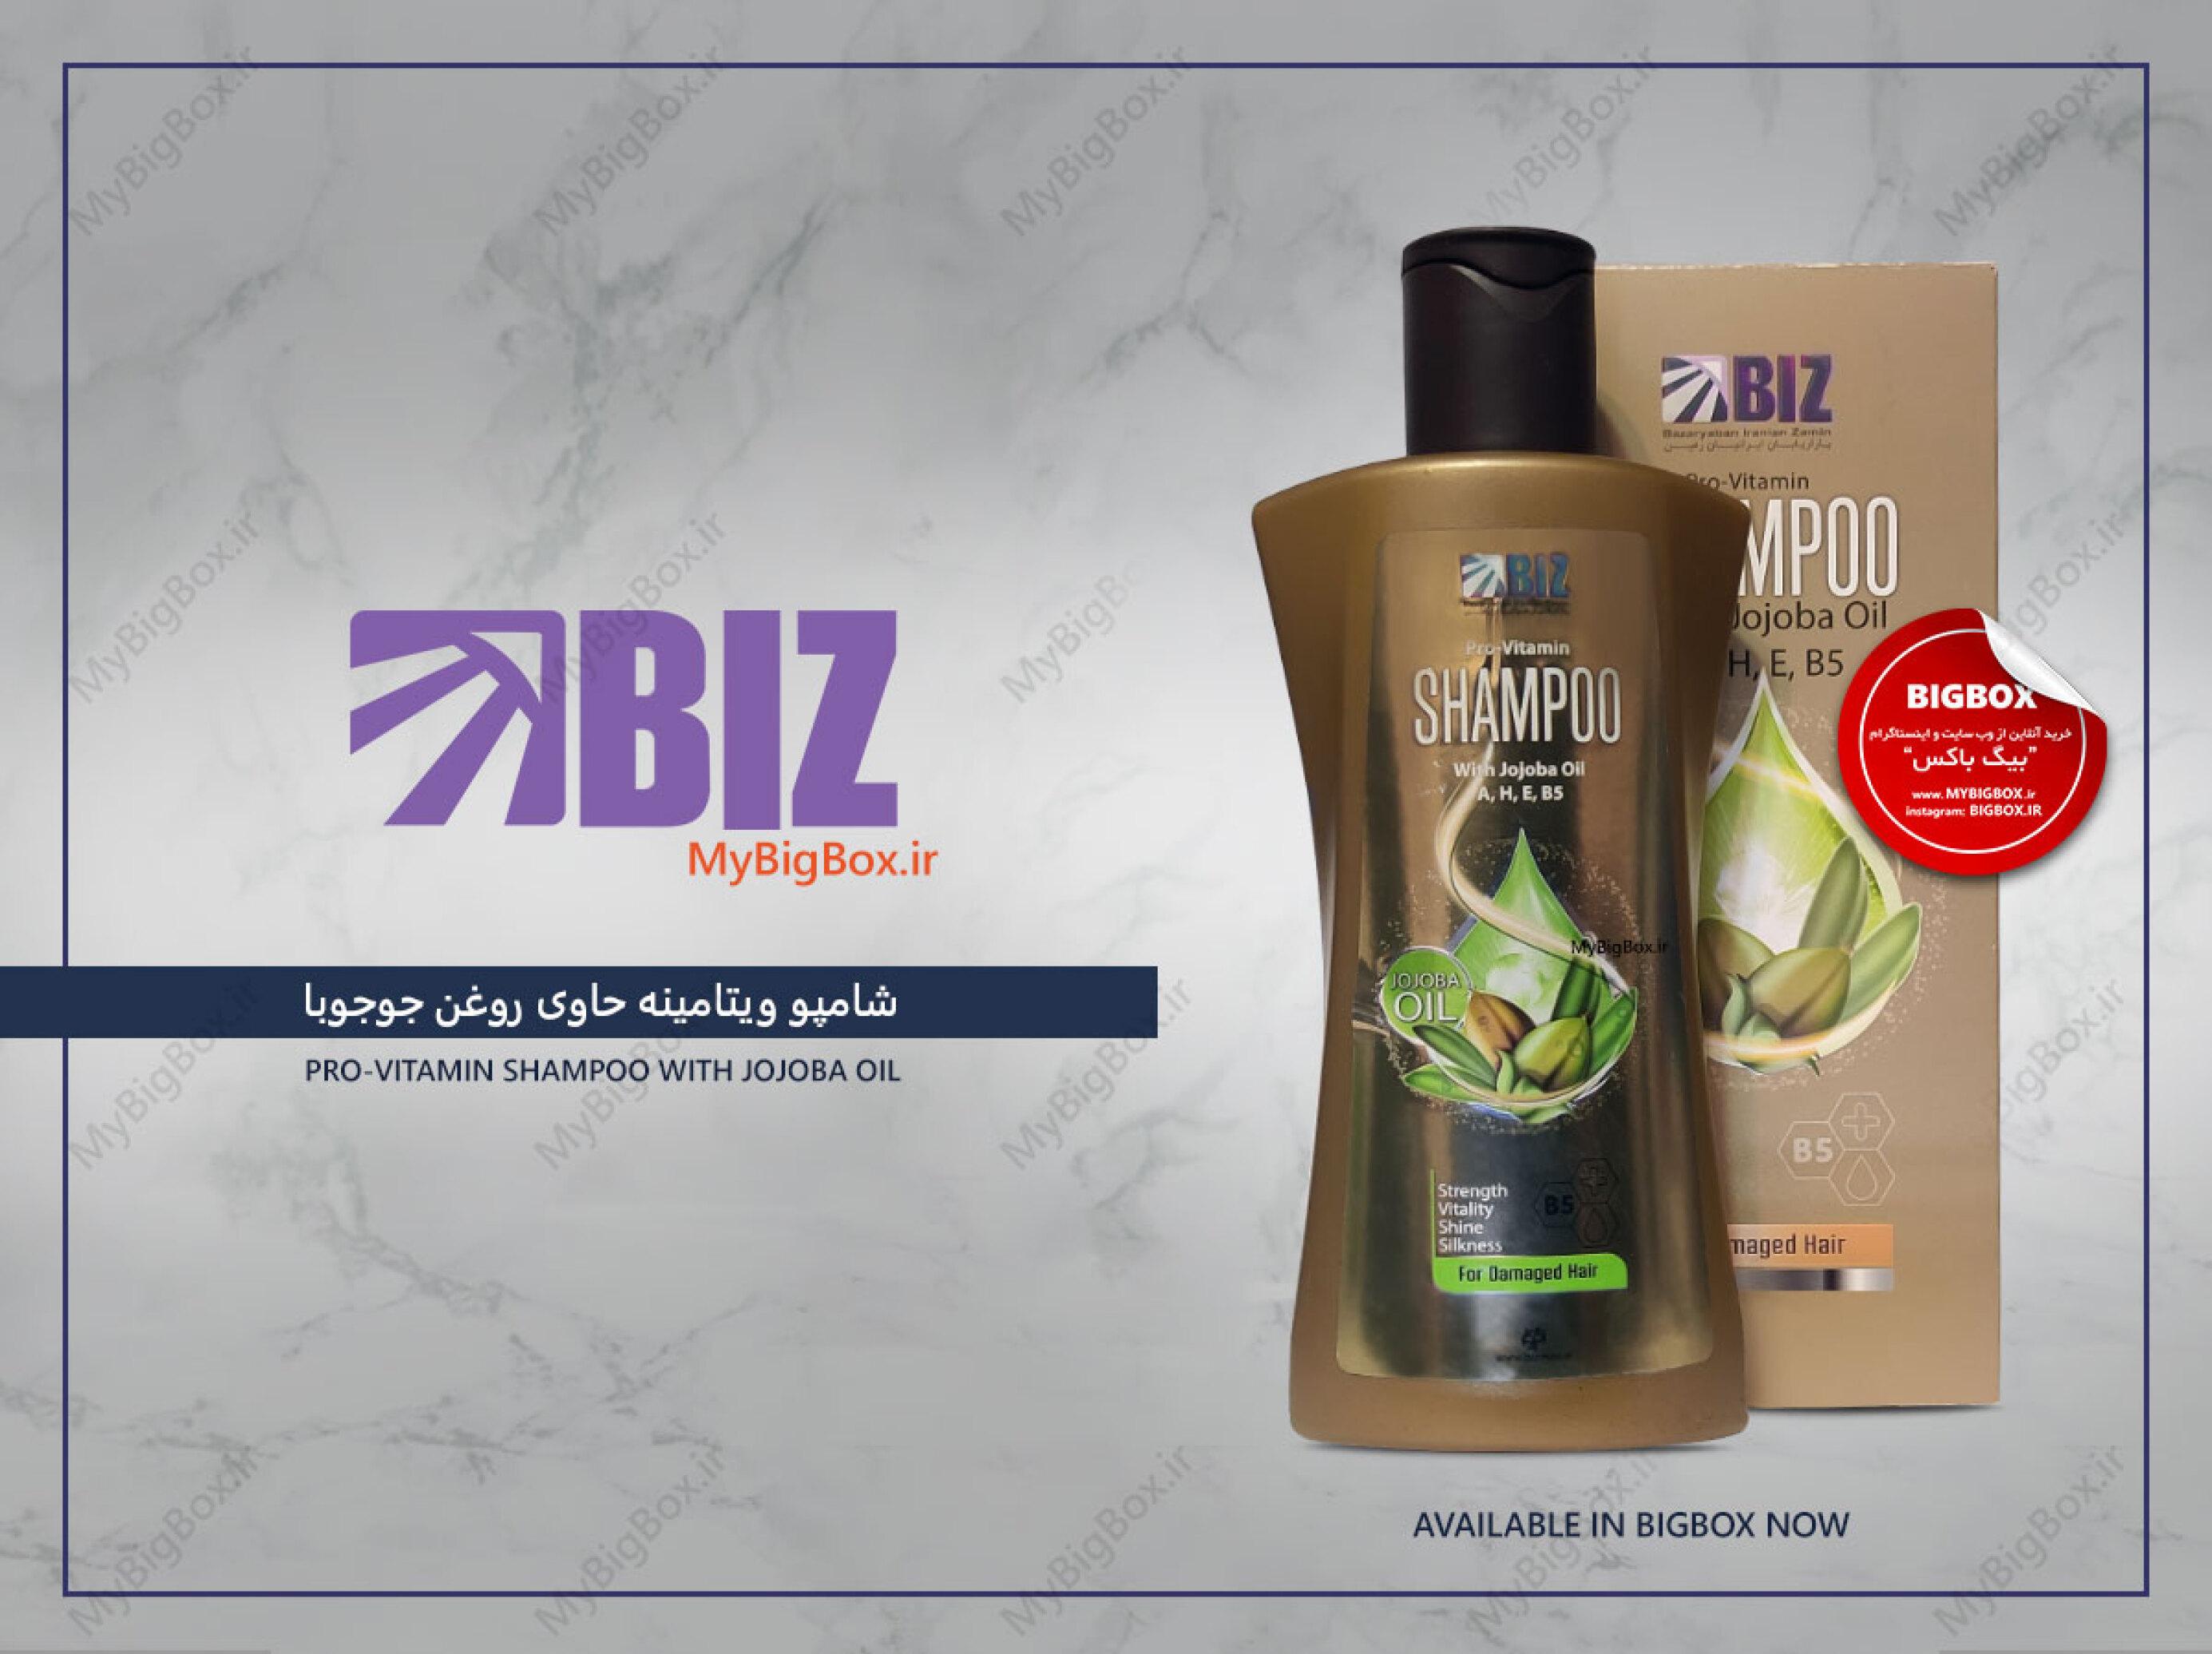 شامپو ویتامینه موی سر بیز مدل جوجوبا حجم 300 میلی لیتر Biz Pro-Vitamin shampoo with jojoba